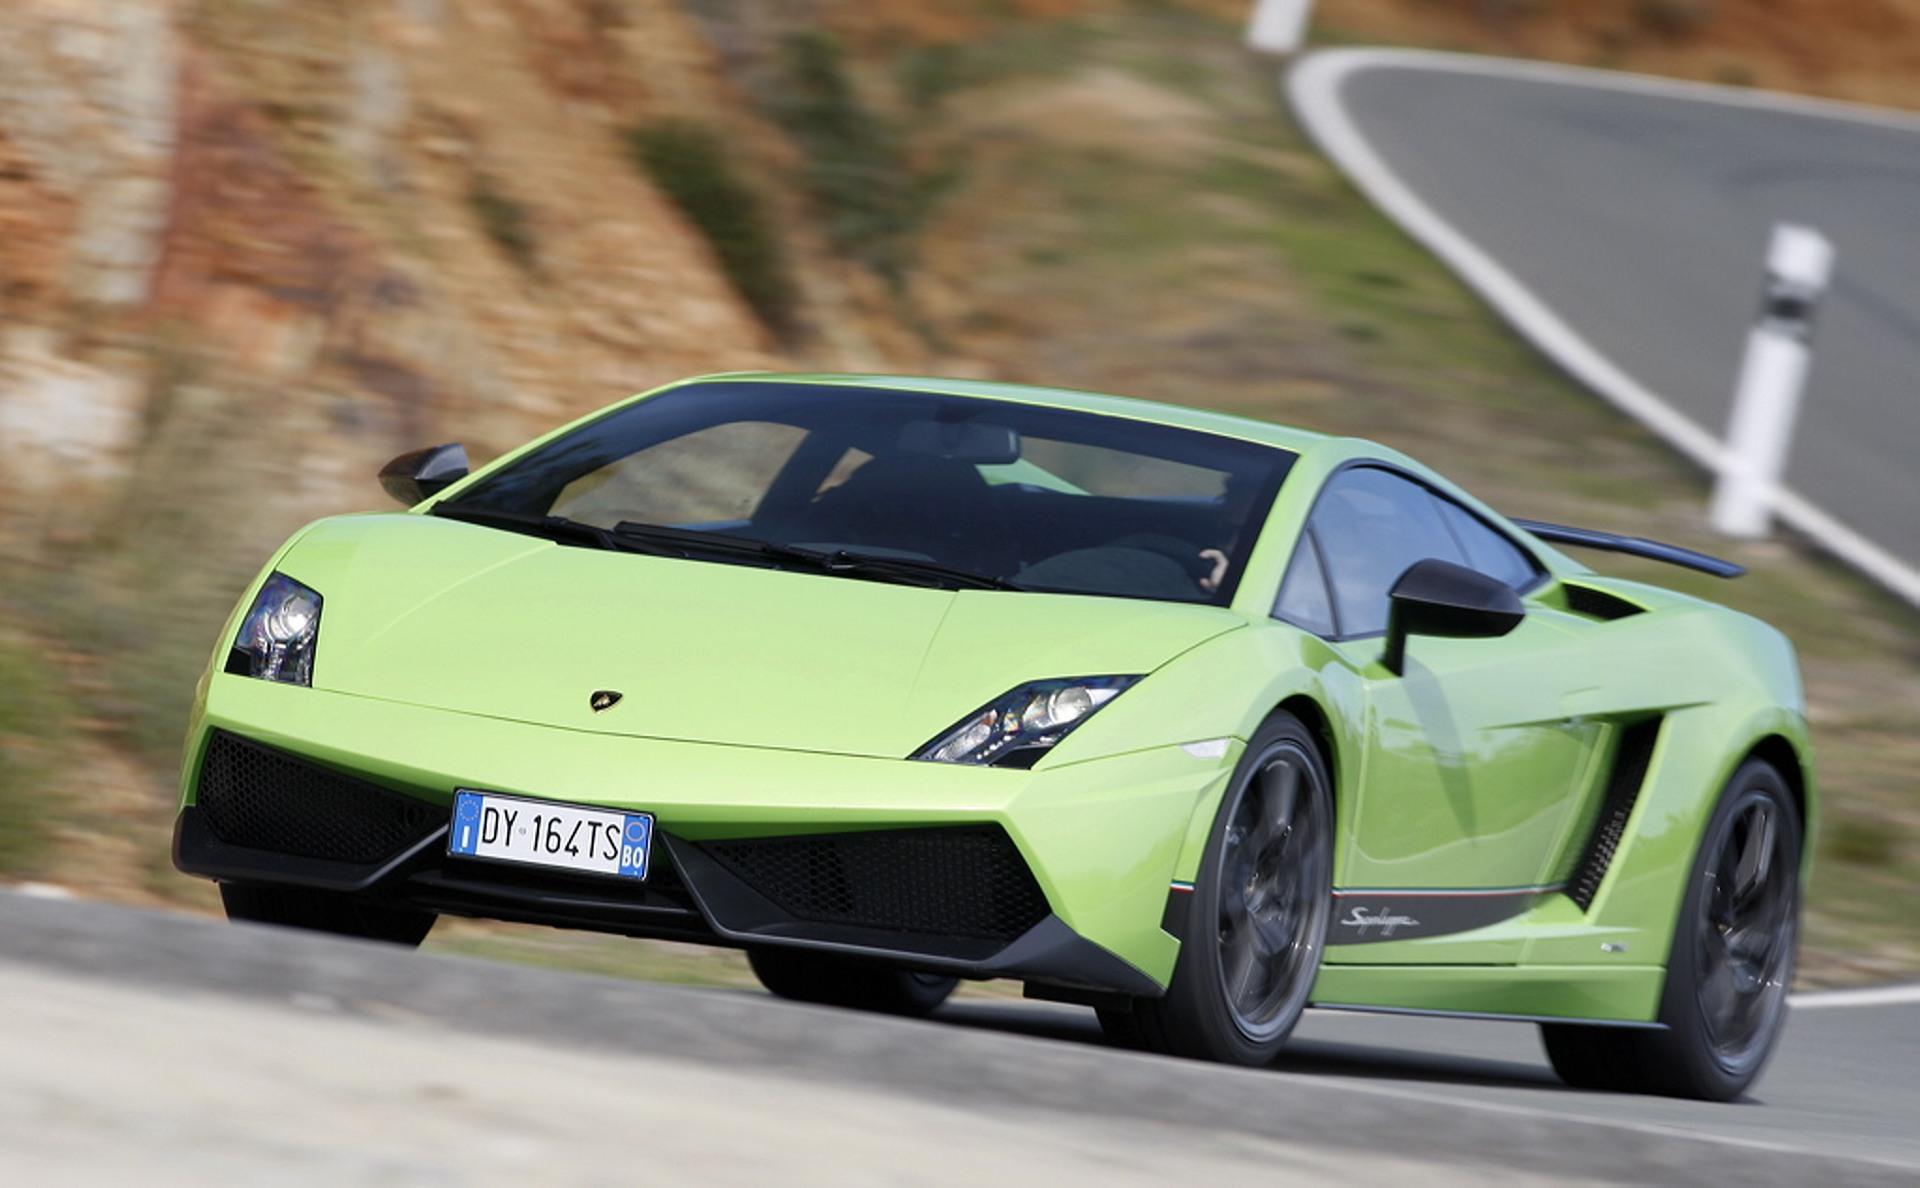 2011 Lamborghini Gallardo Lp 570 4 Superleggera News And Information